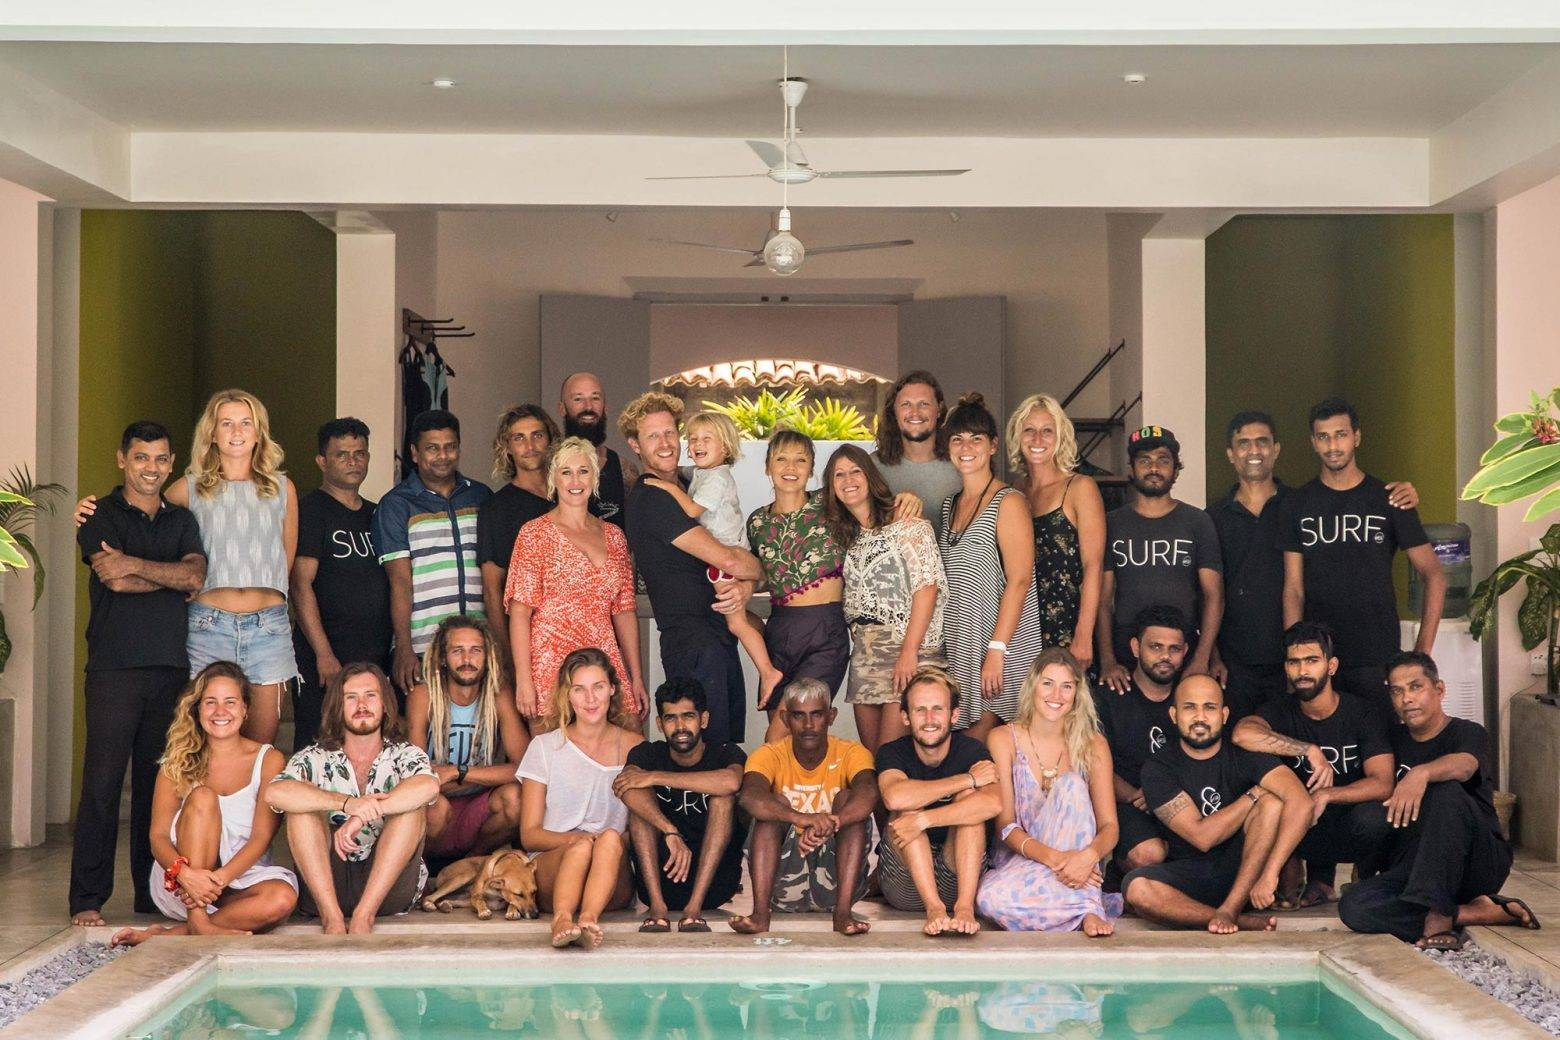 https://www.soulandsurf.com/wp-content/uploads/2021/08/us-team-images-@pierswoodford_Team_2018_1-e1628610818278.jpeg